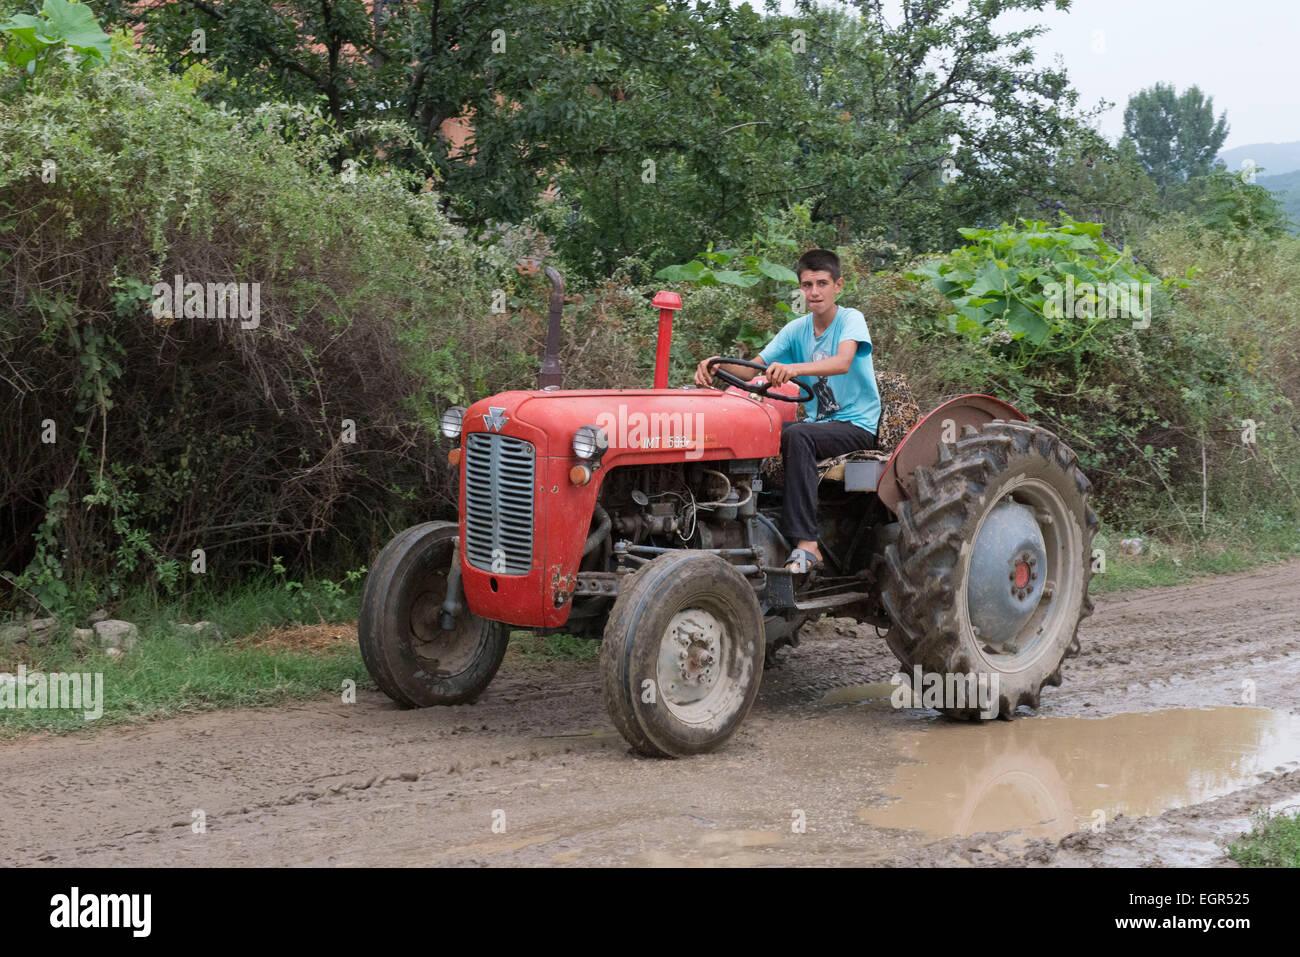 Tractor Macedonia Stock Photos & Tractor Macedonia Stock Images - Alamy